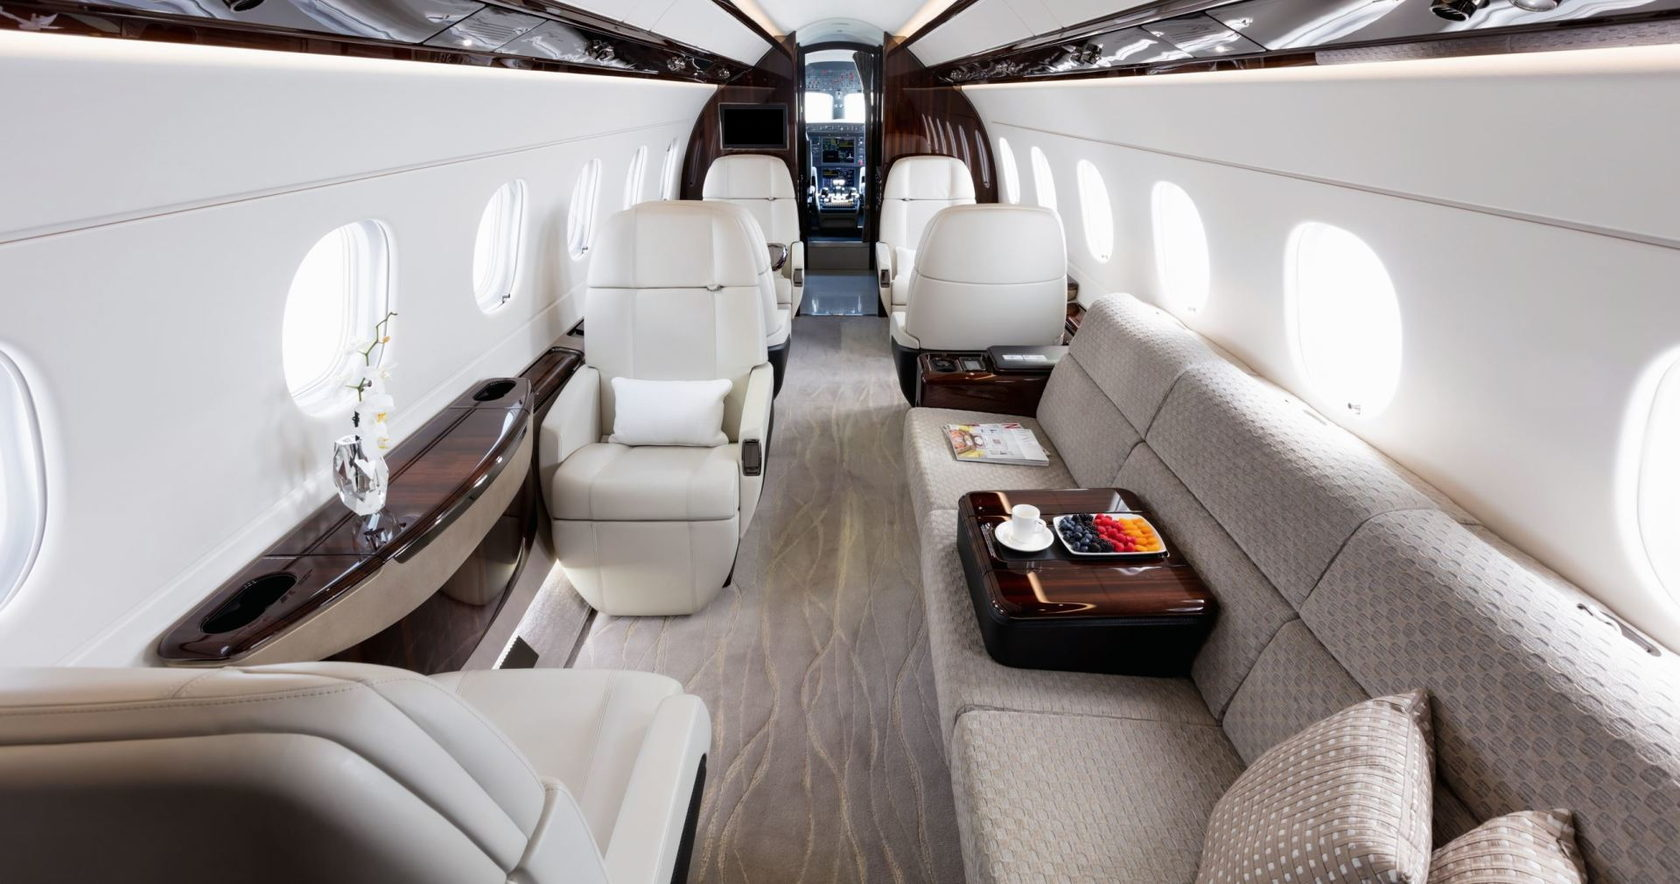 Embraer Legacy 50 - Embraer positions Legacy 500